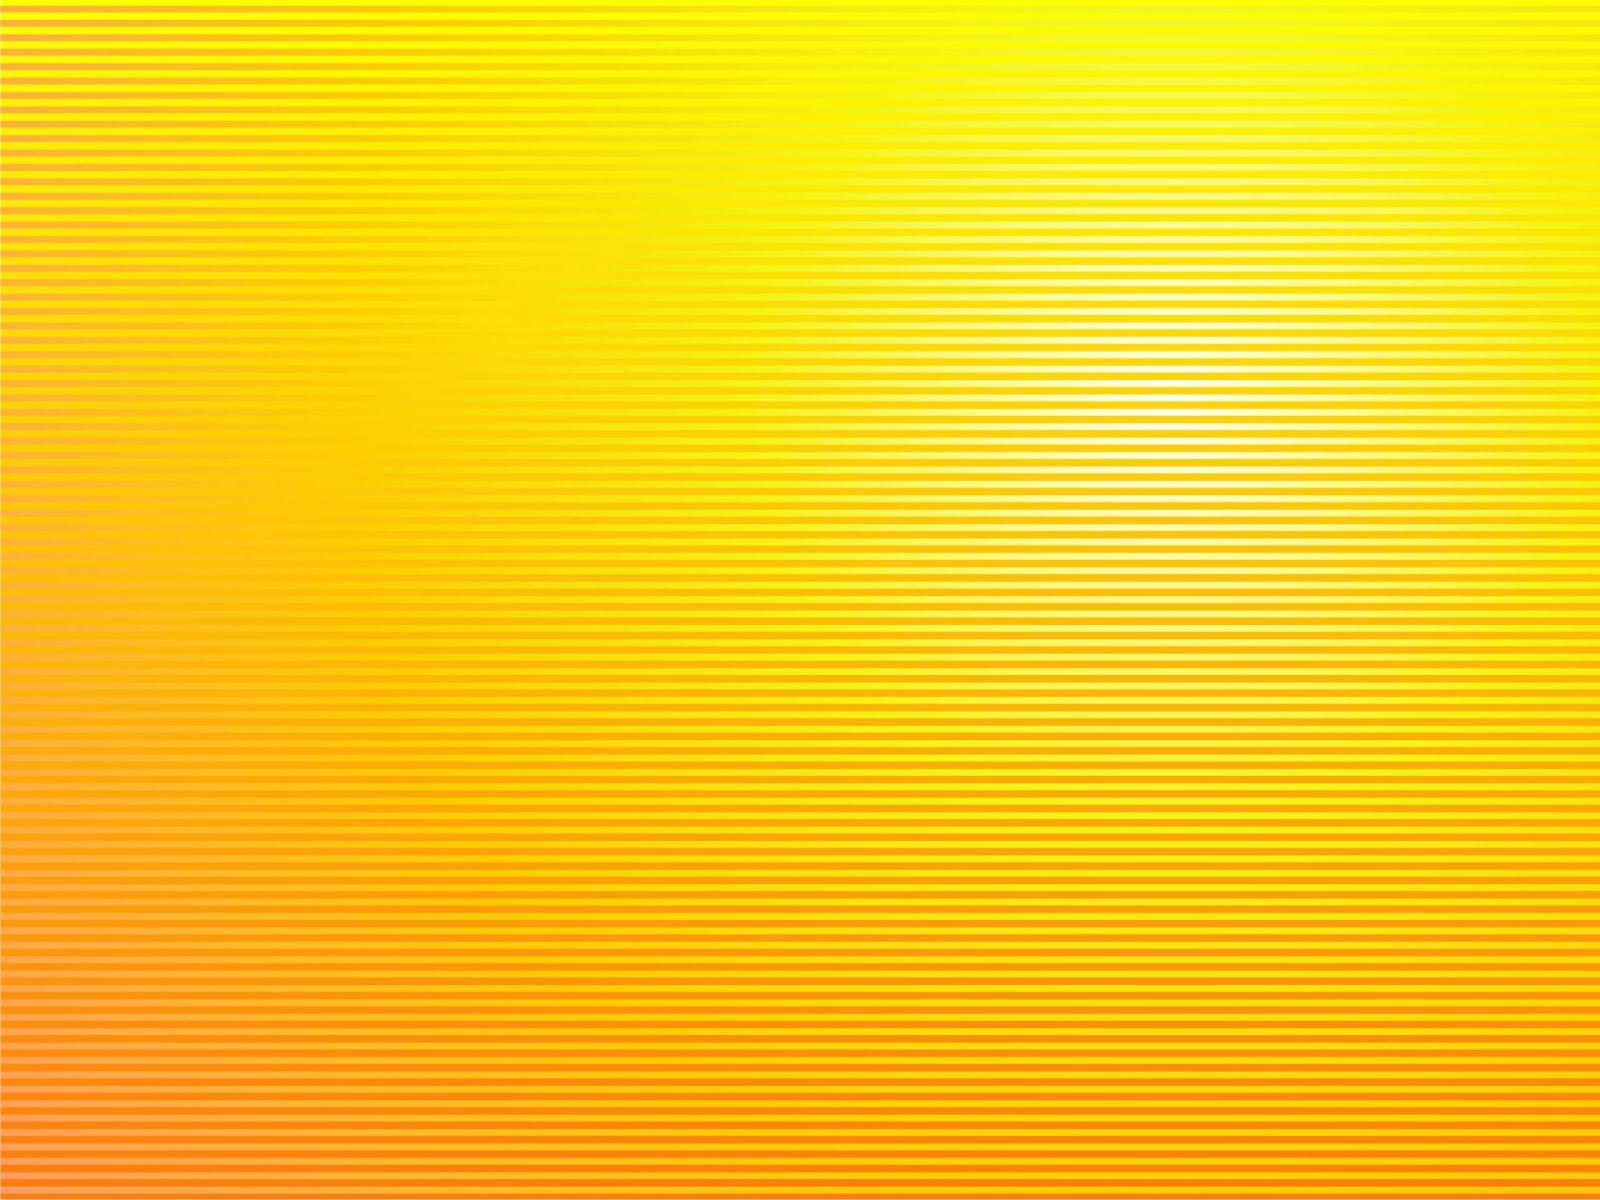 Yellow Background Images - WallpaperSafari